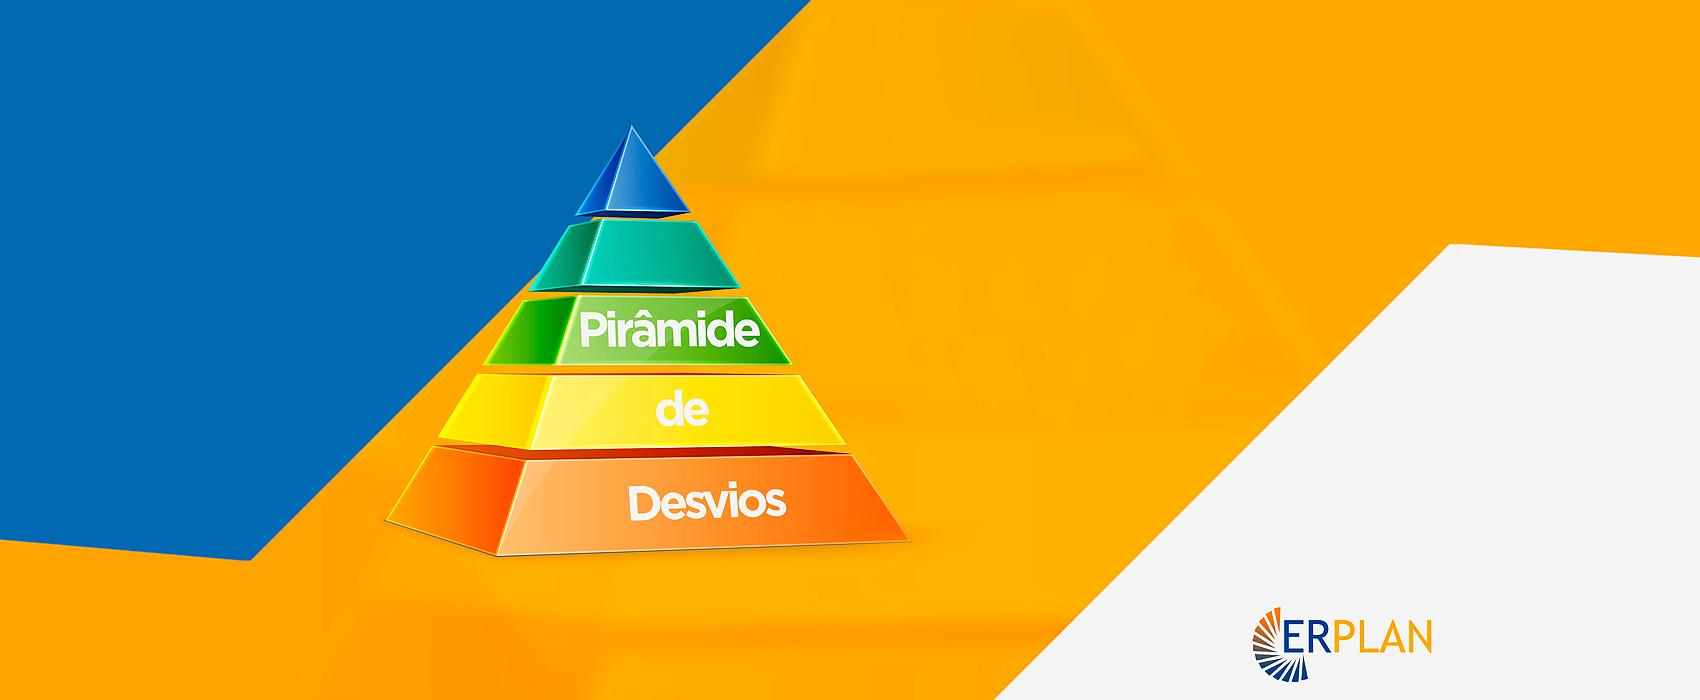 piramide-de-desvios-capa